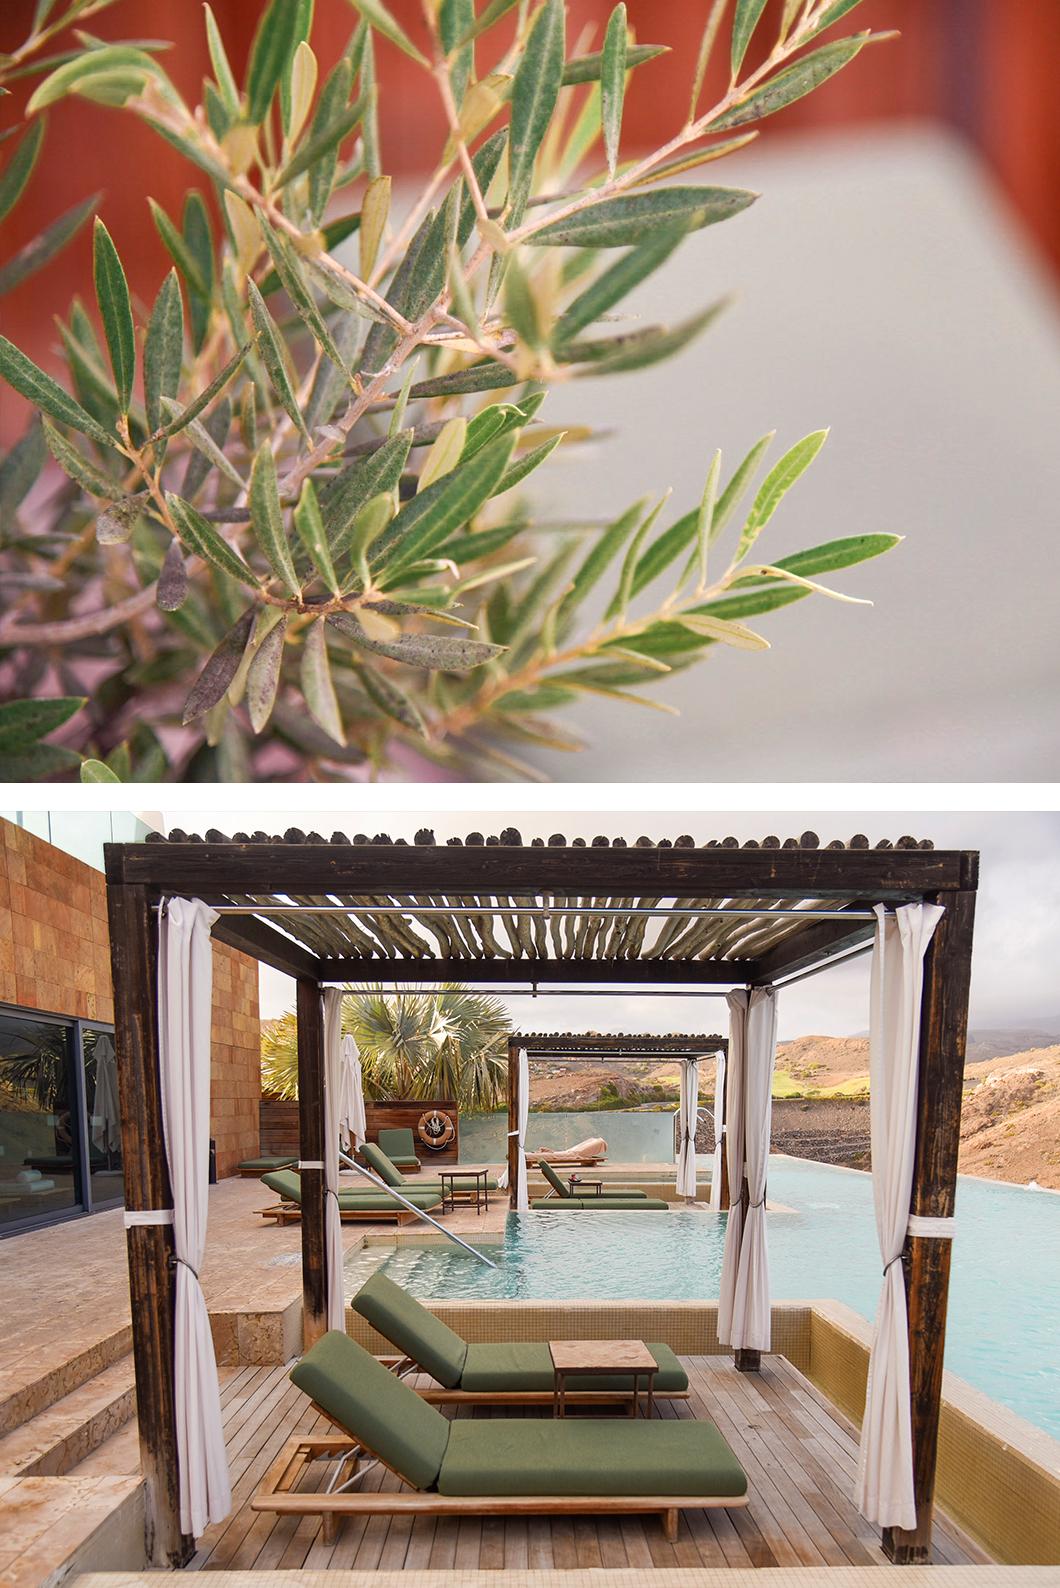 Salobre Hotel Resort & Serenity, Hotel de luxe à Grande Canarie